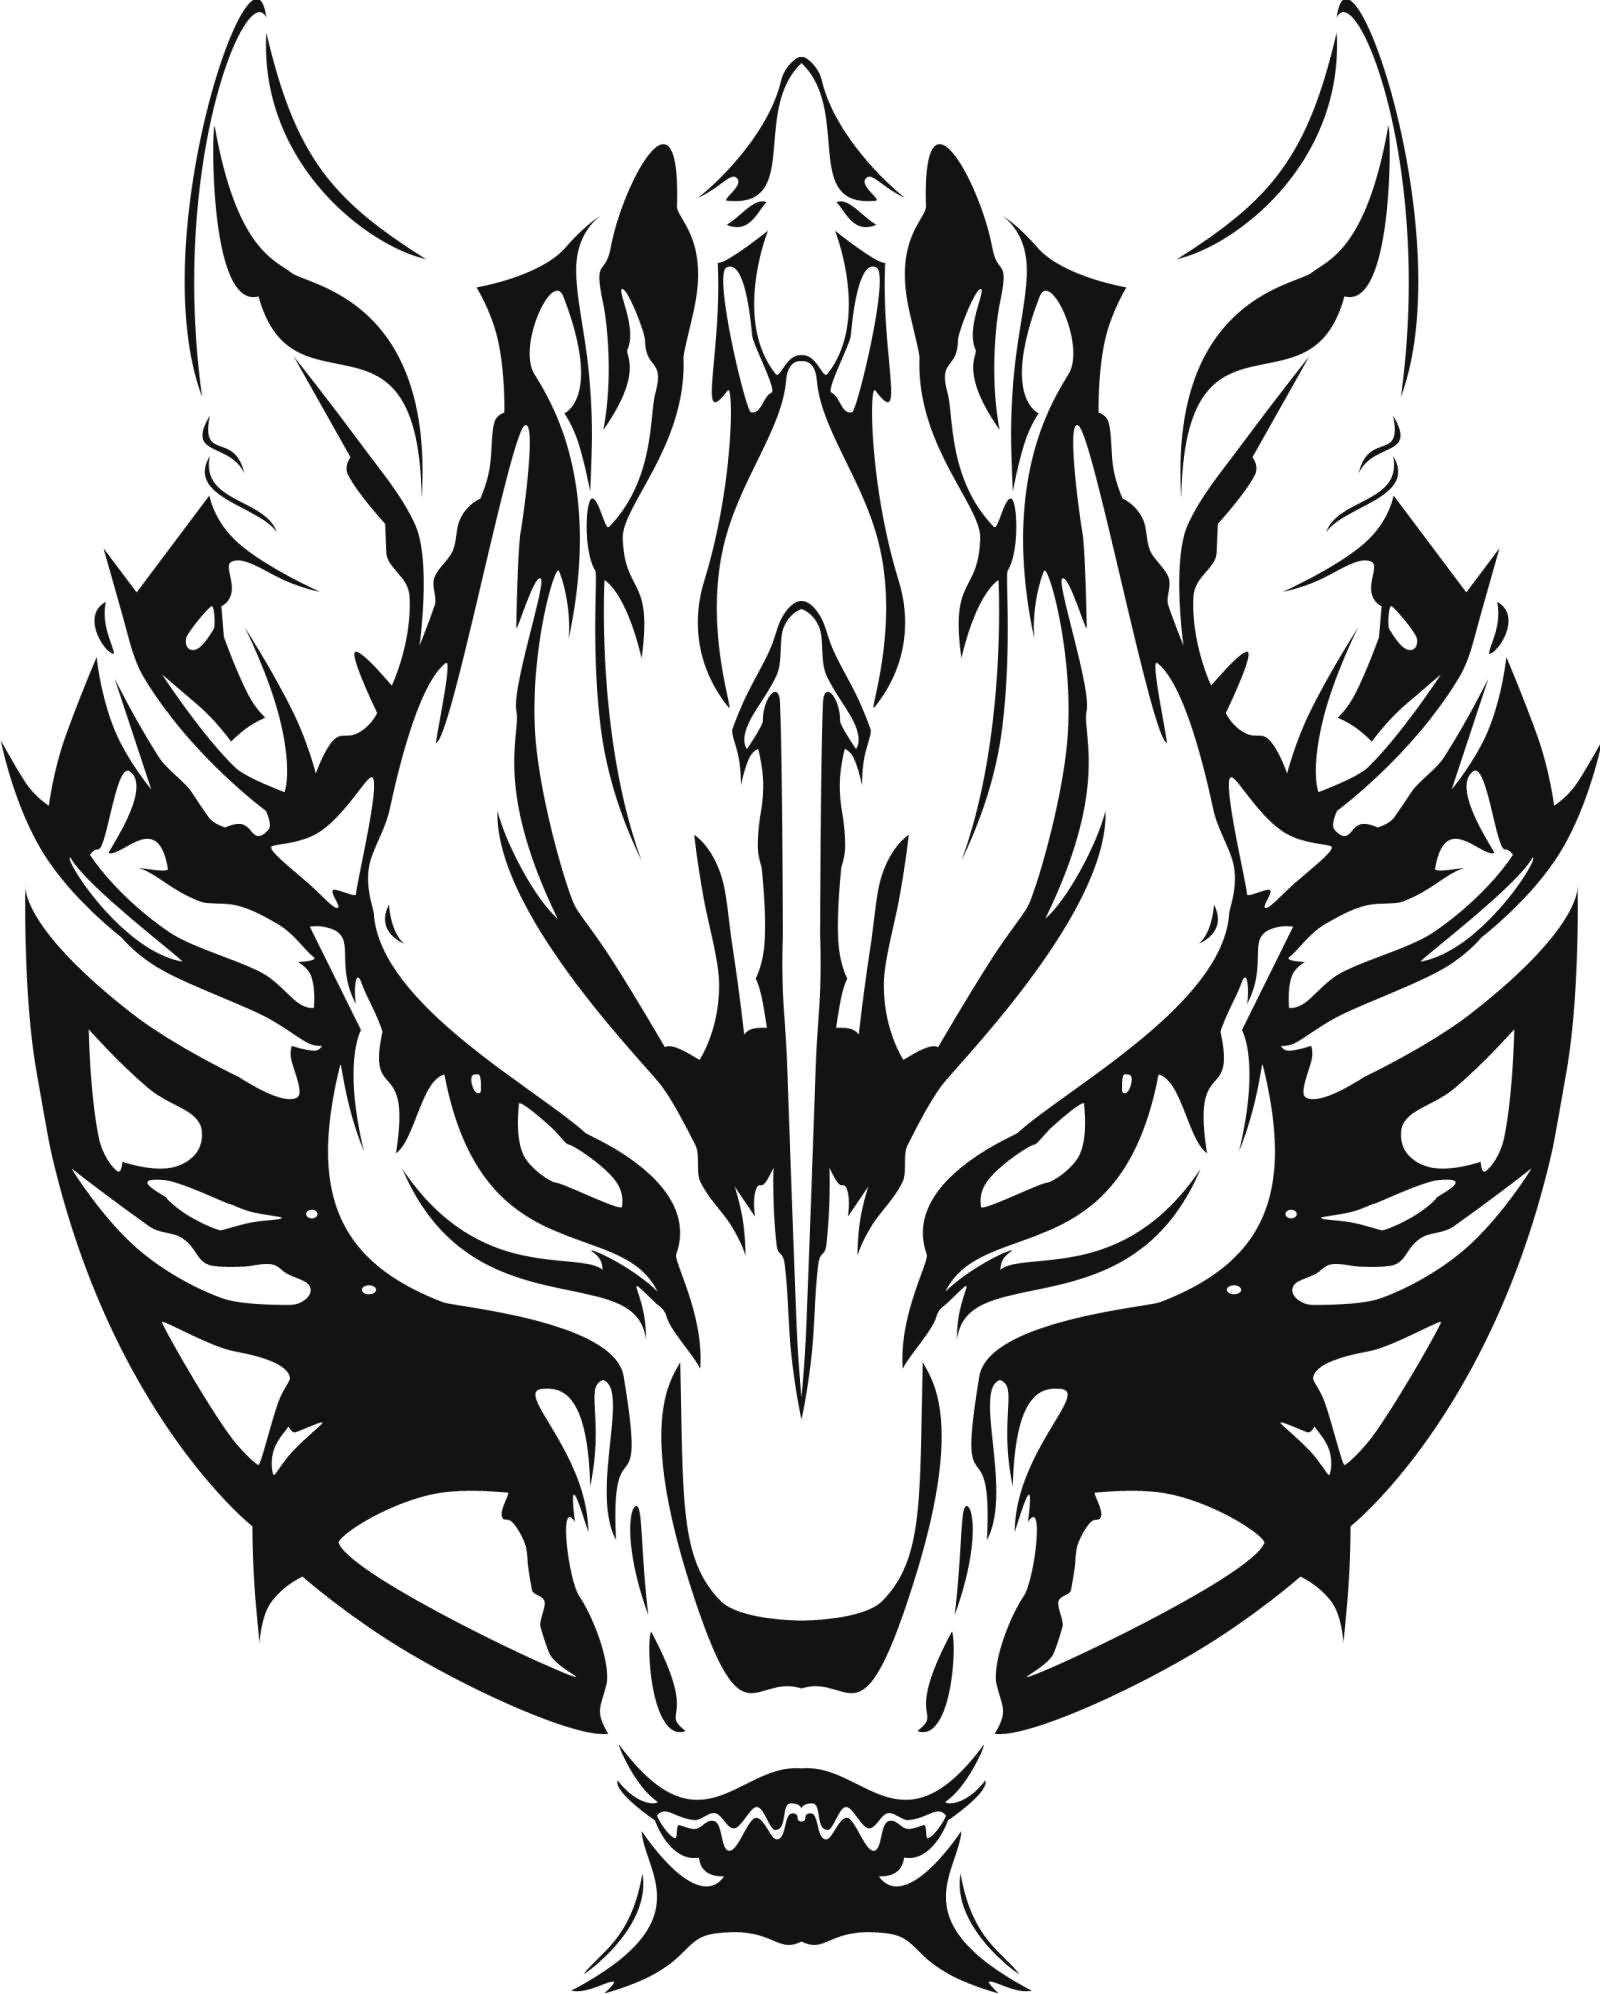 d9a82cb89 Outline Fenrir Tattoo Design by Milhamethyz